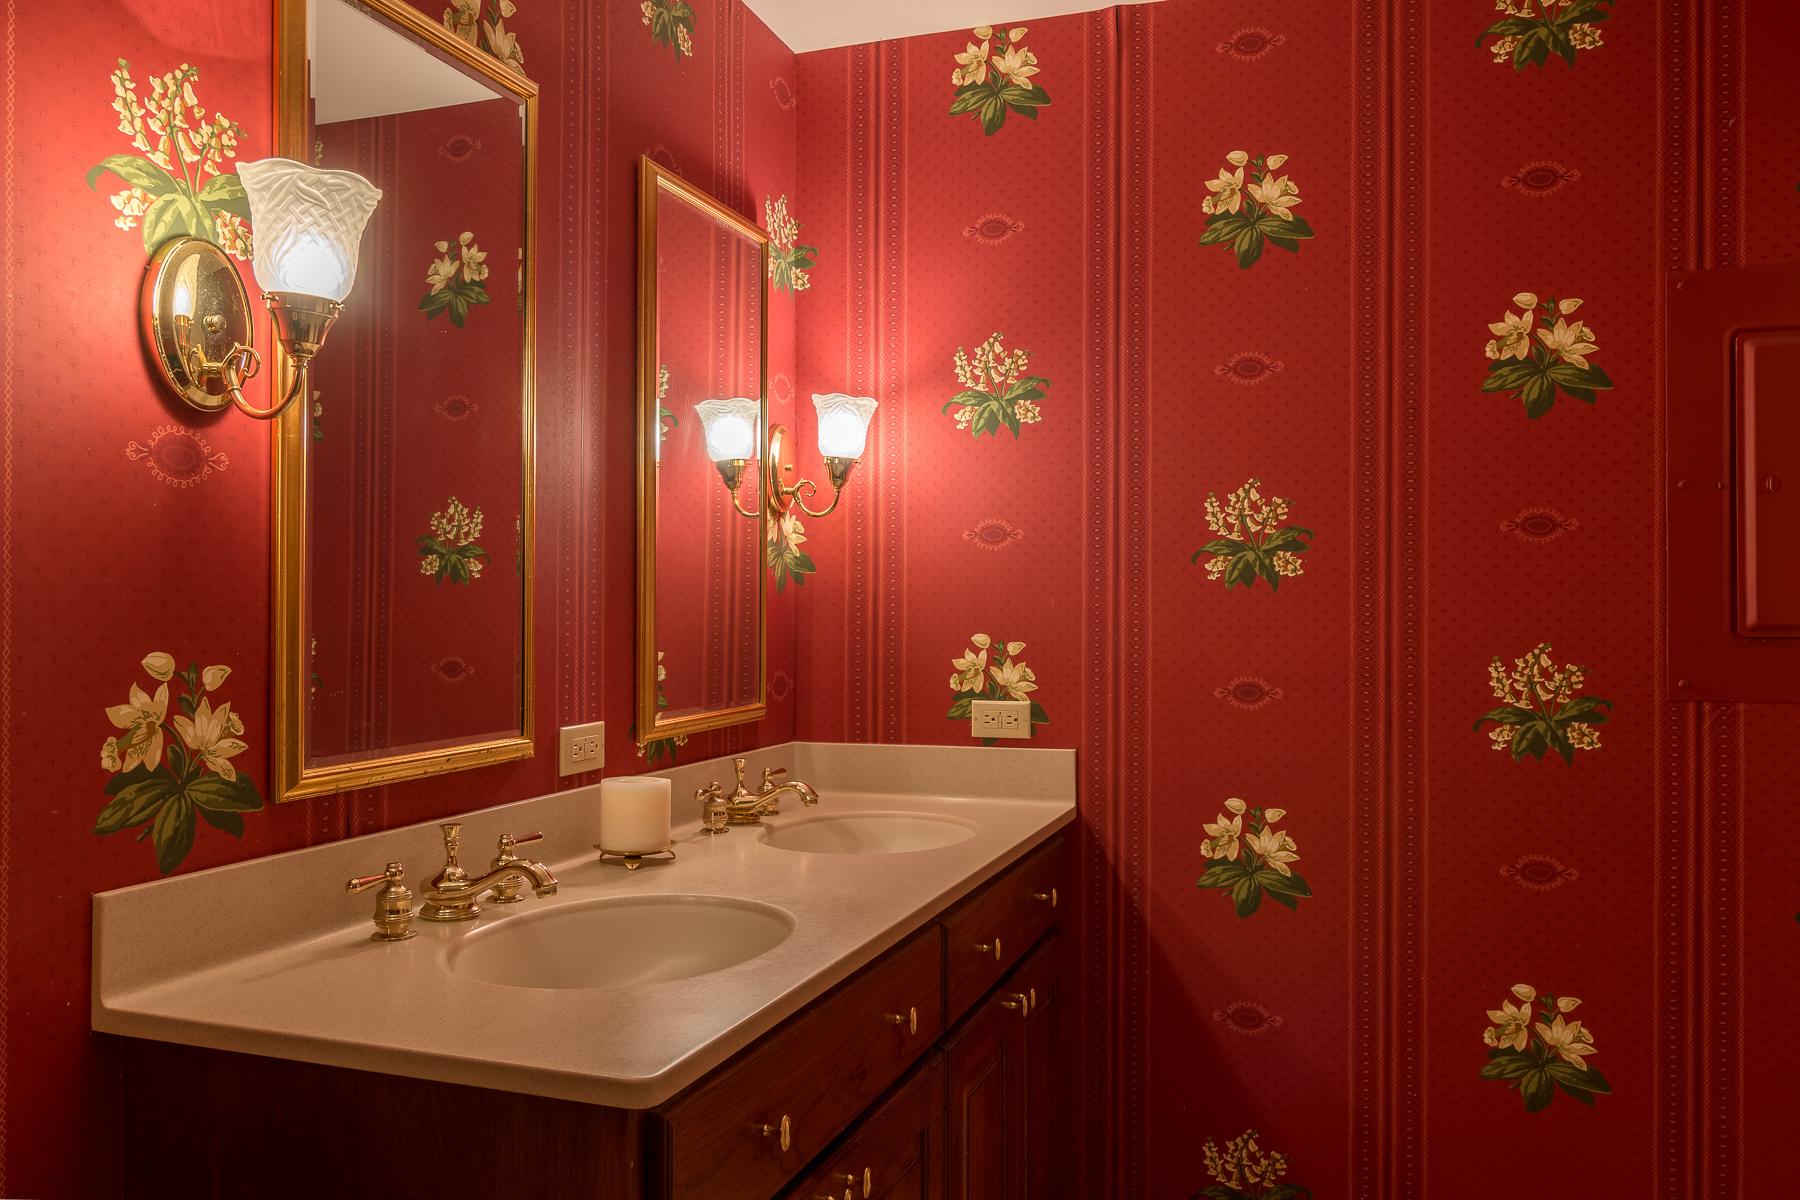 Additional photo for property listing at Waterfront Condo 84 E Genesee St Skaneateles, Nueva York 13152 Estados Unidos